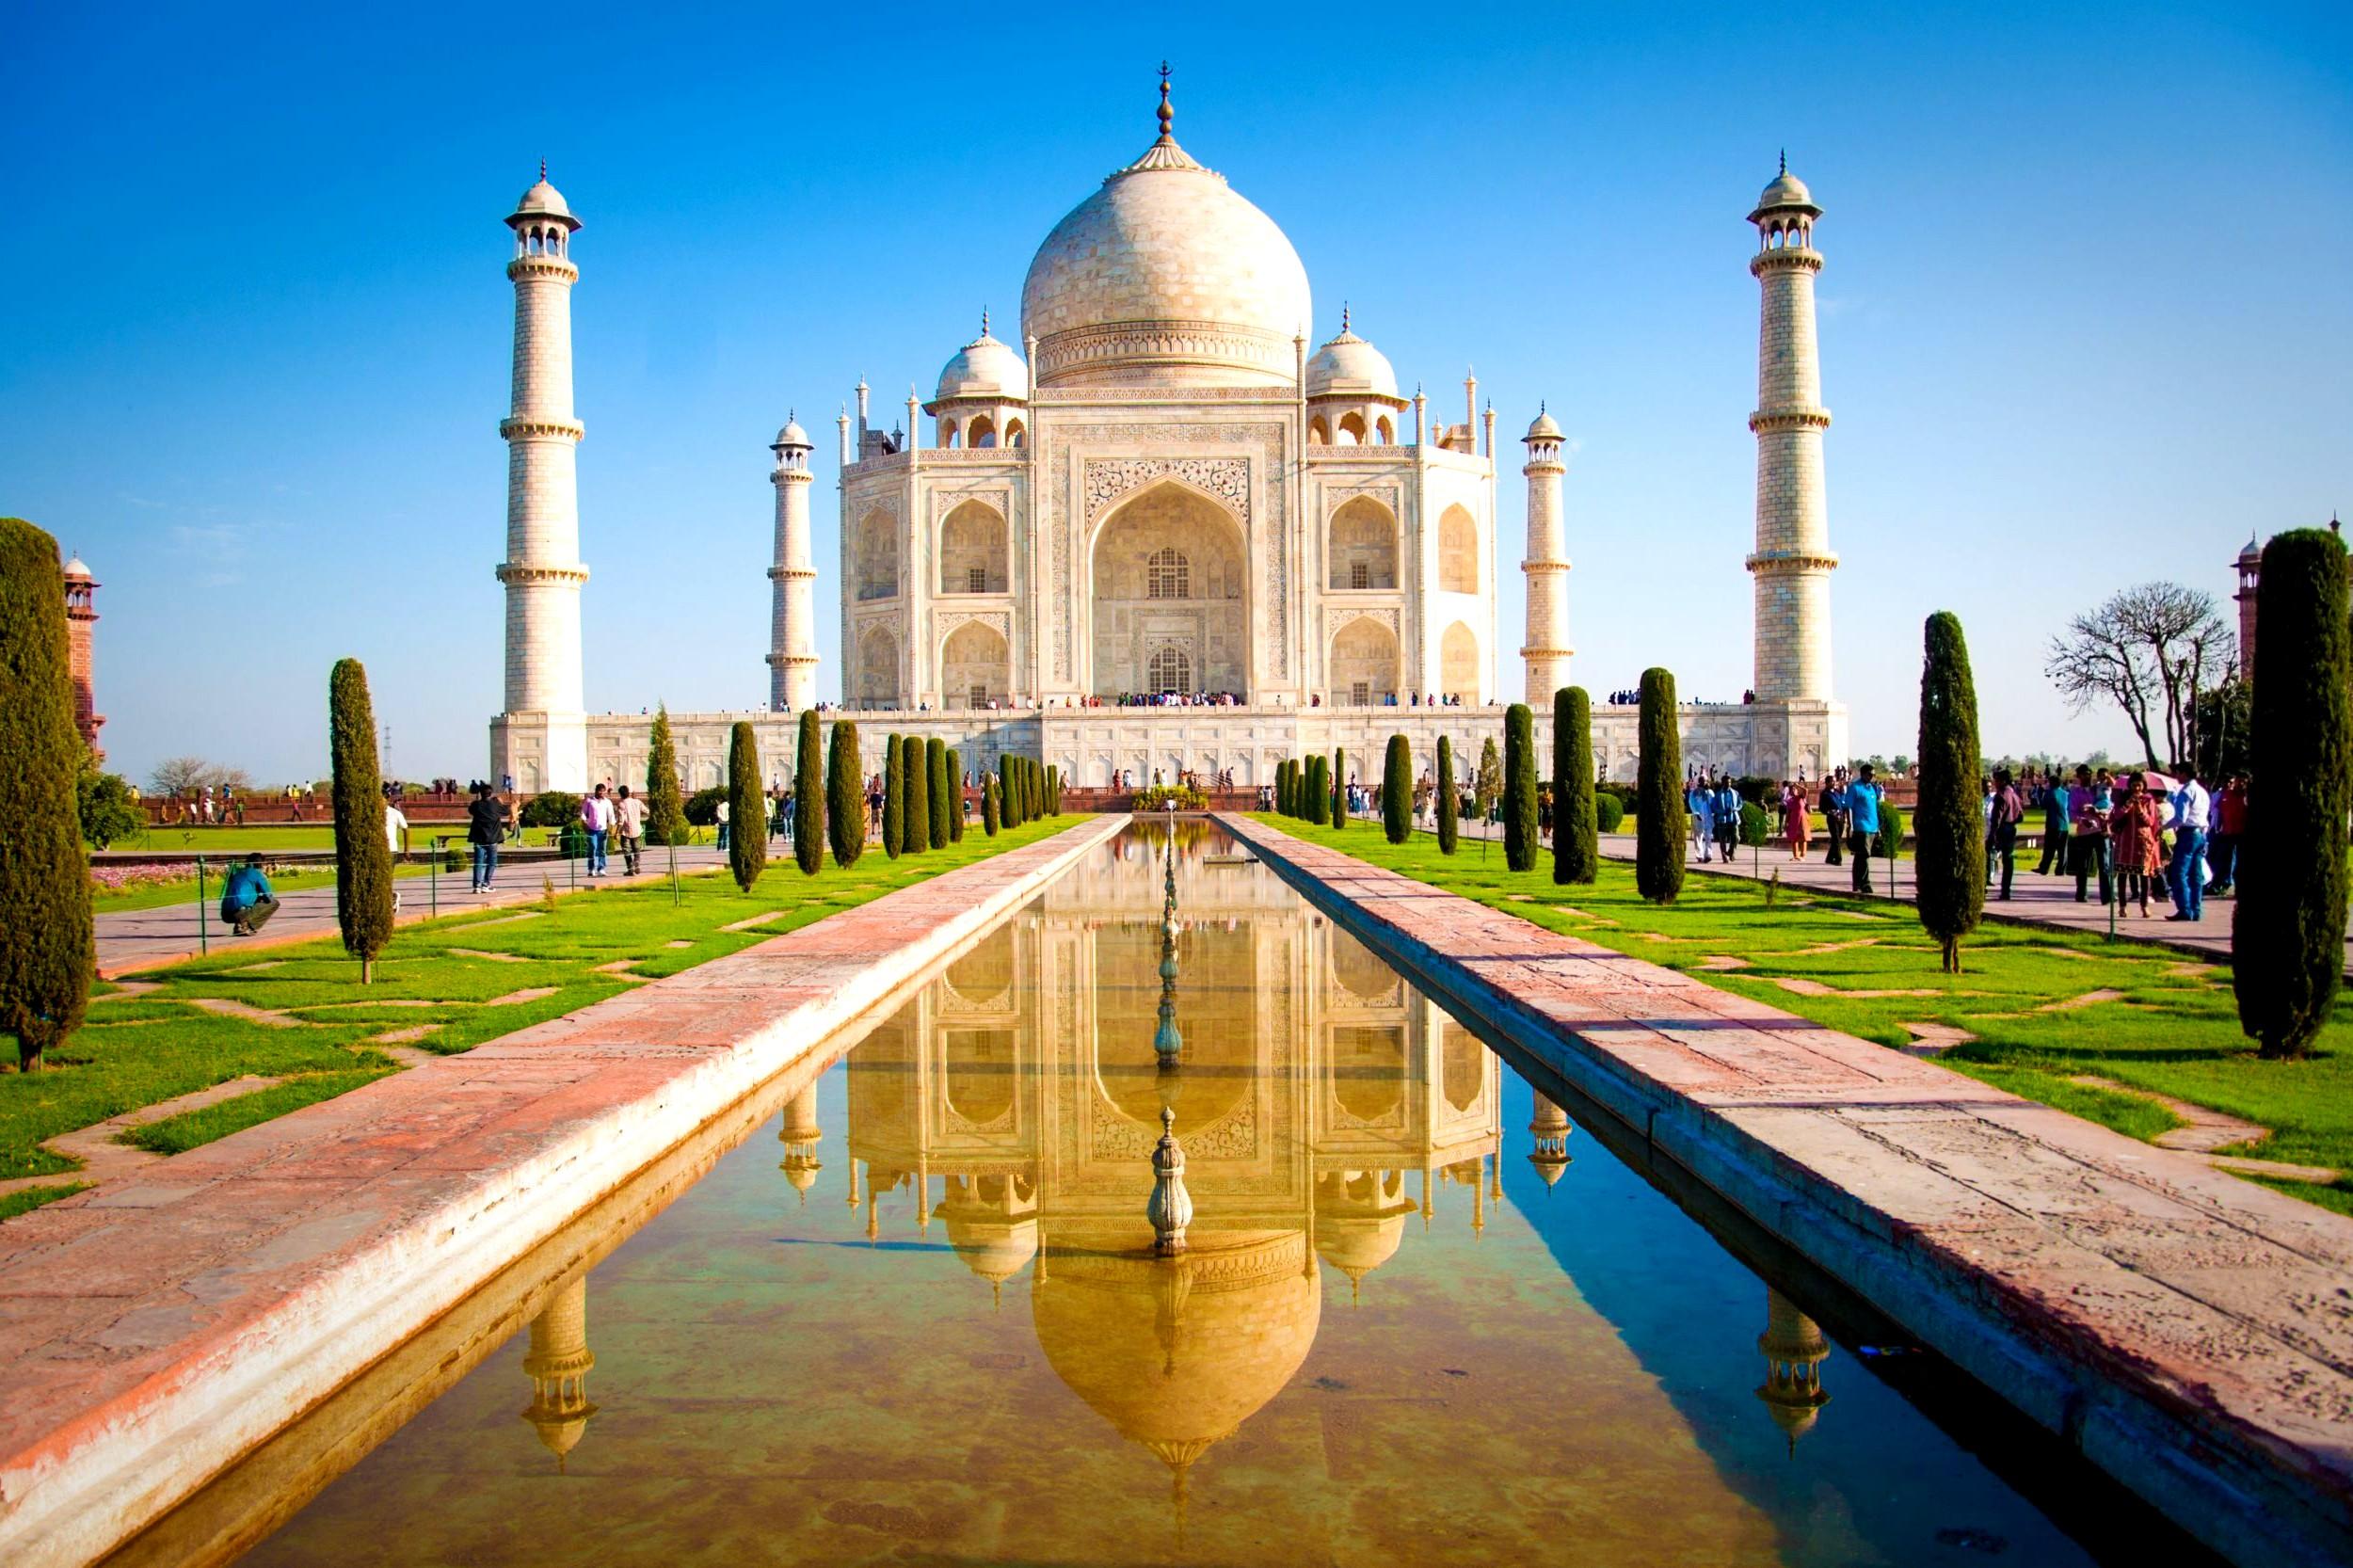 File:Taj-Mahal.jpg - Wikimedia Commons